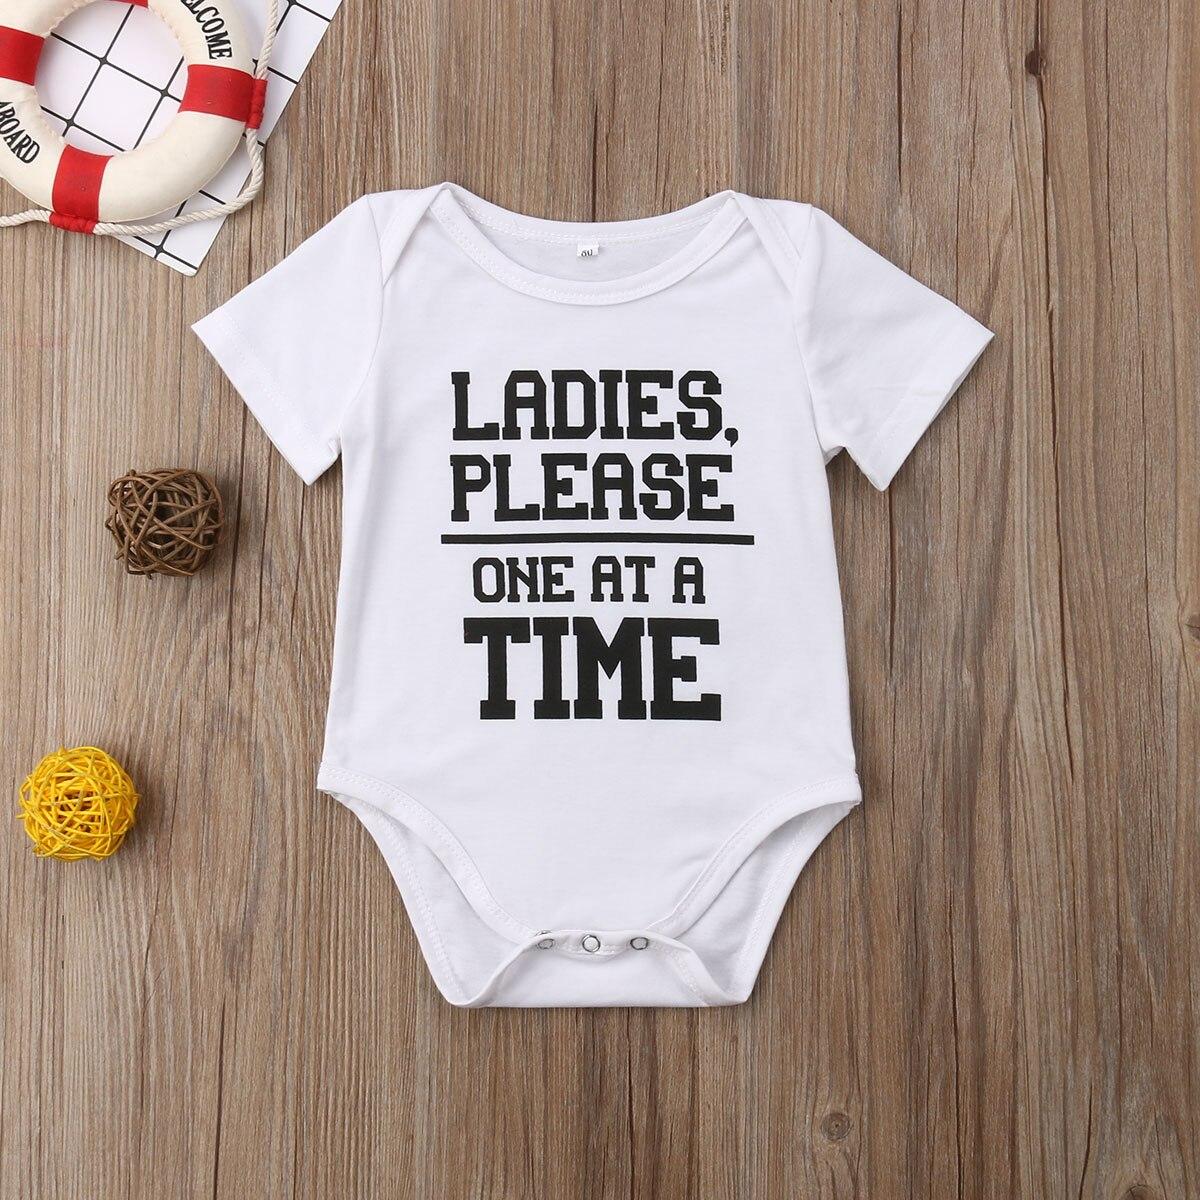 Newborn Infant Baby Girls Boy Short Sleeve   Romper   Clothes Playsuit Letter Jumpsuit